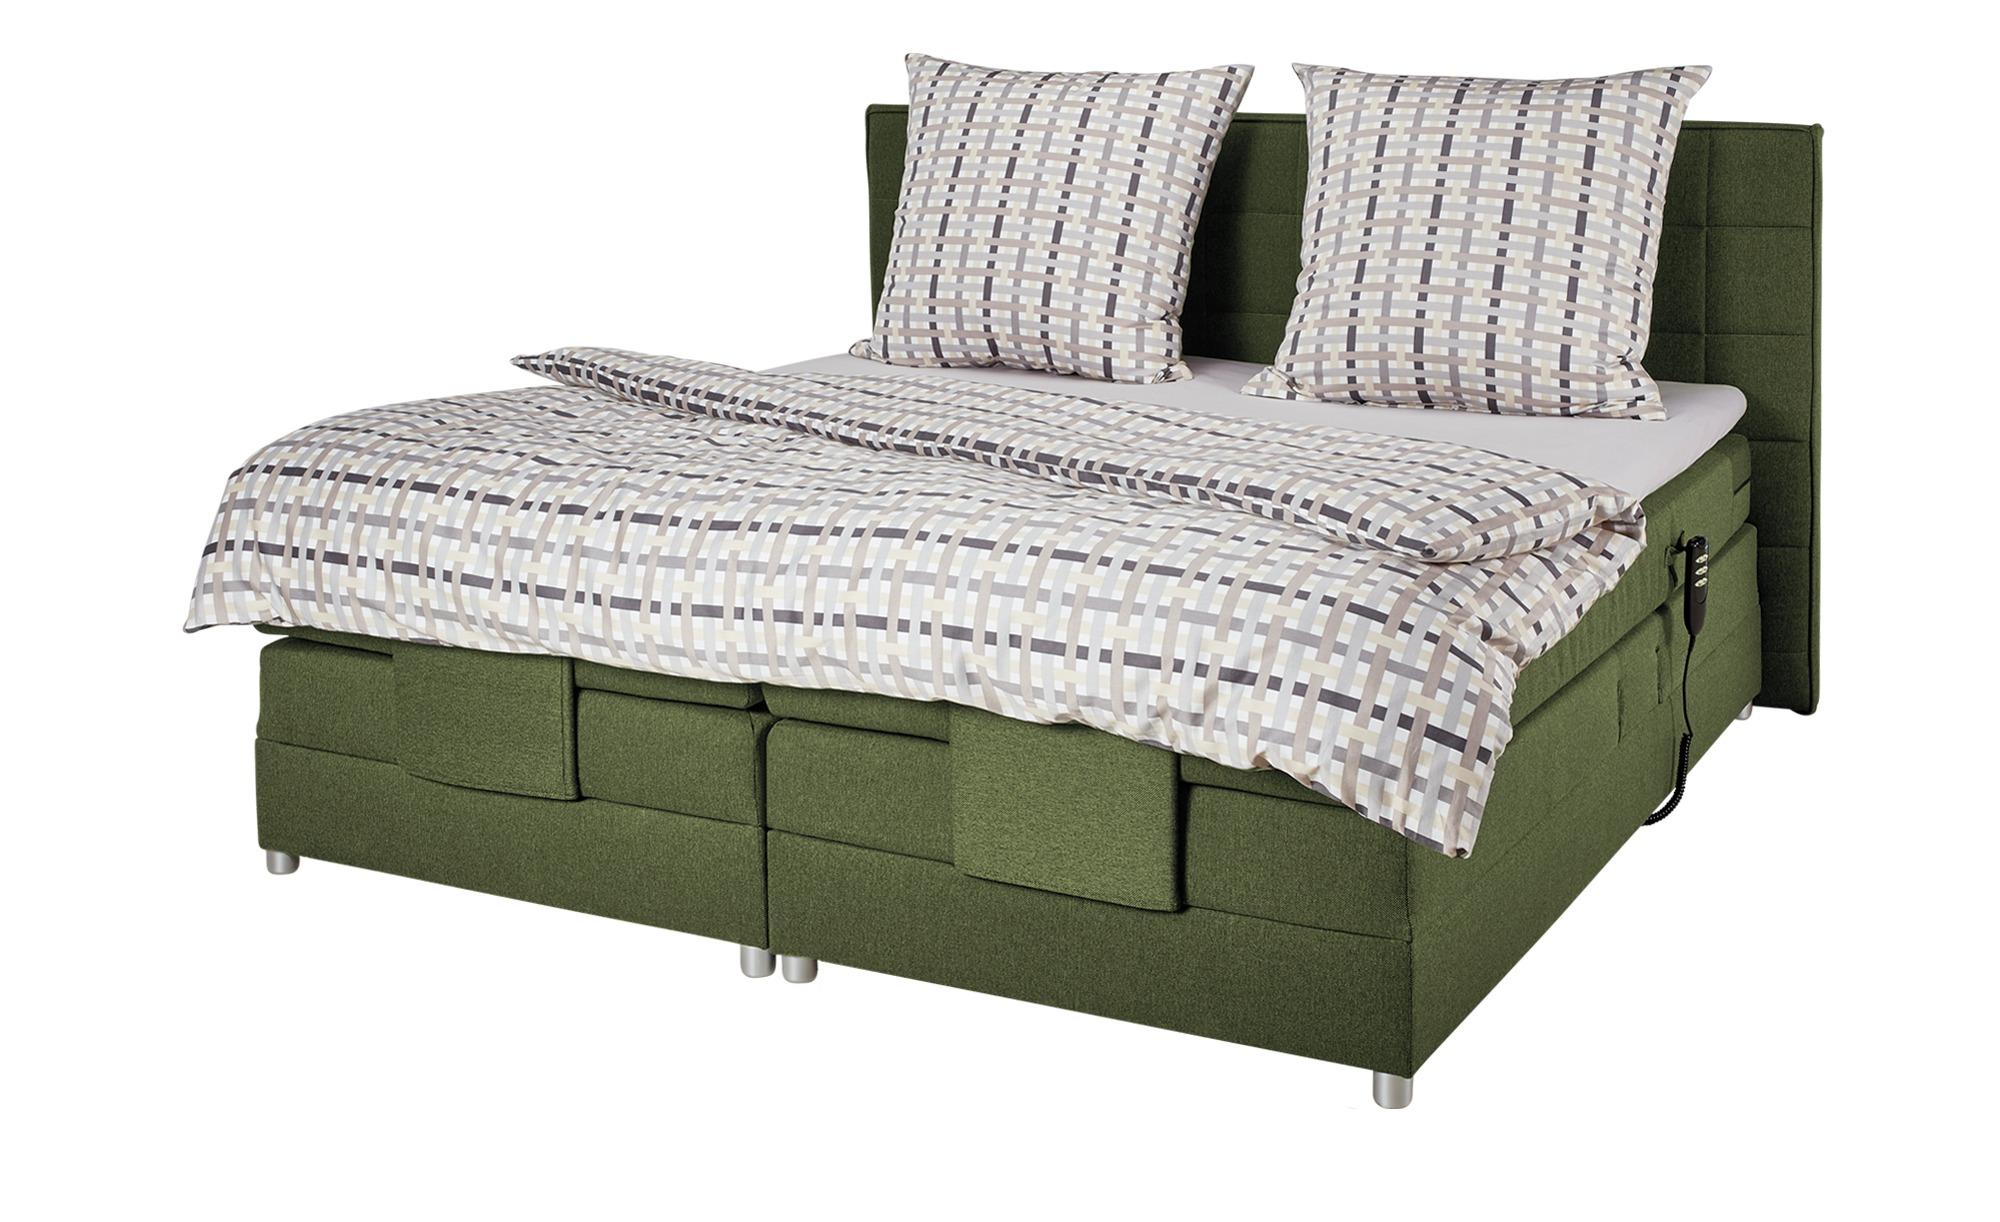 uno motor boxspringbett 180x200 gr n montana gr n. Black Bedroom Furniture Sets. Home Design Ideas